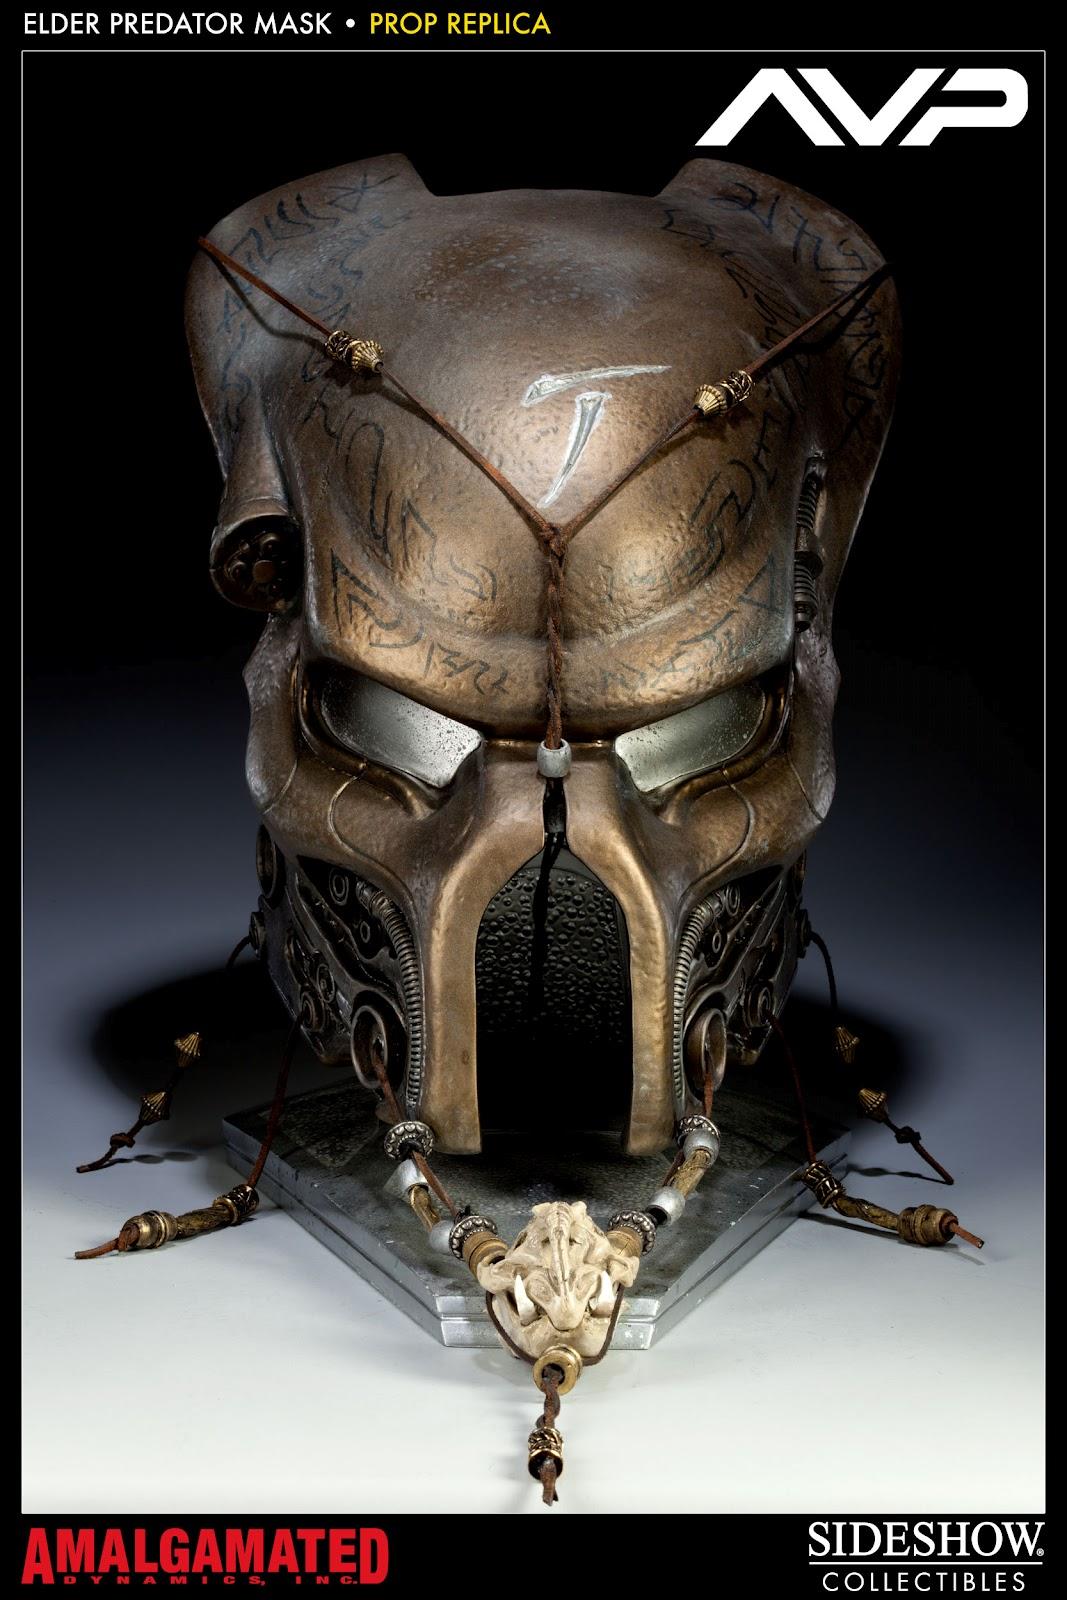 Elder Predator Mask Prop ReplicaWolf Predator Mask Sideshow